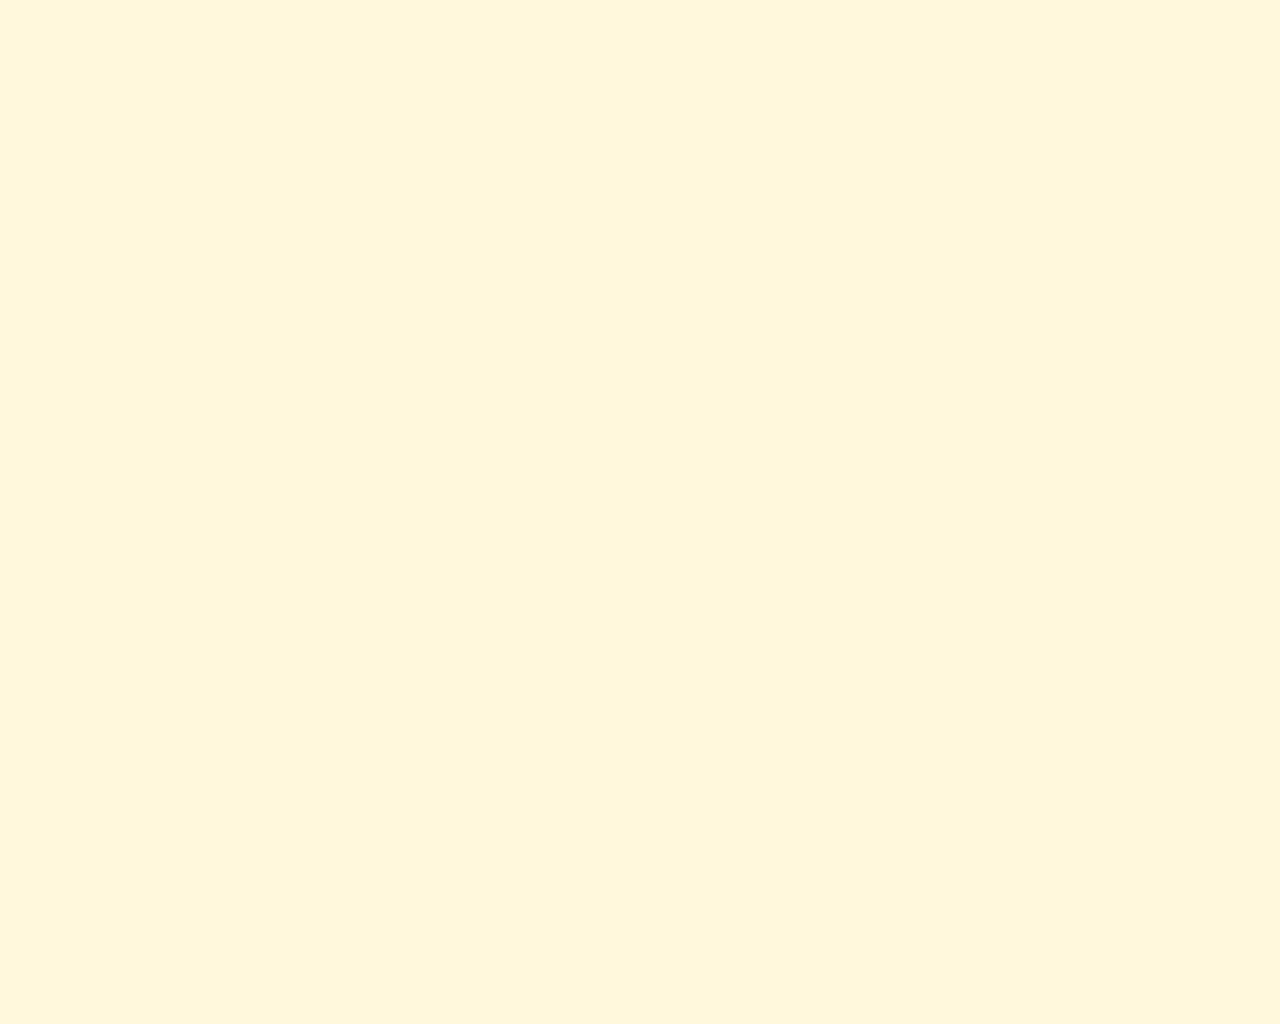 1280x1024 Cornsilk Solid Color Background